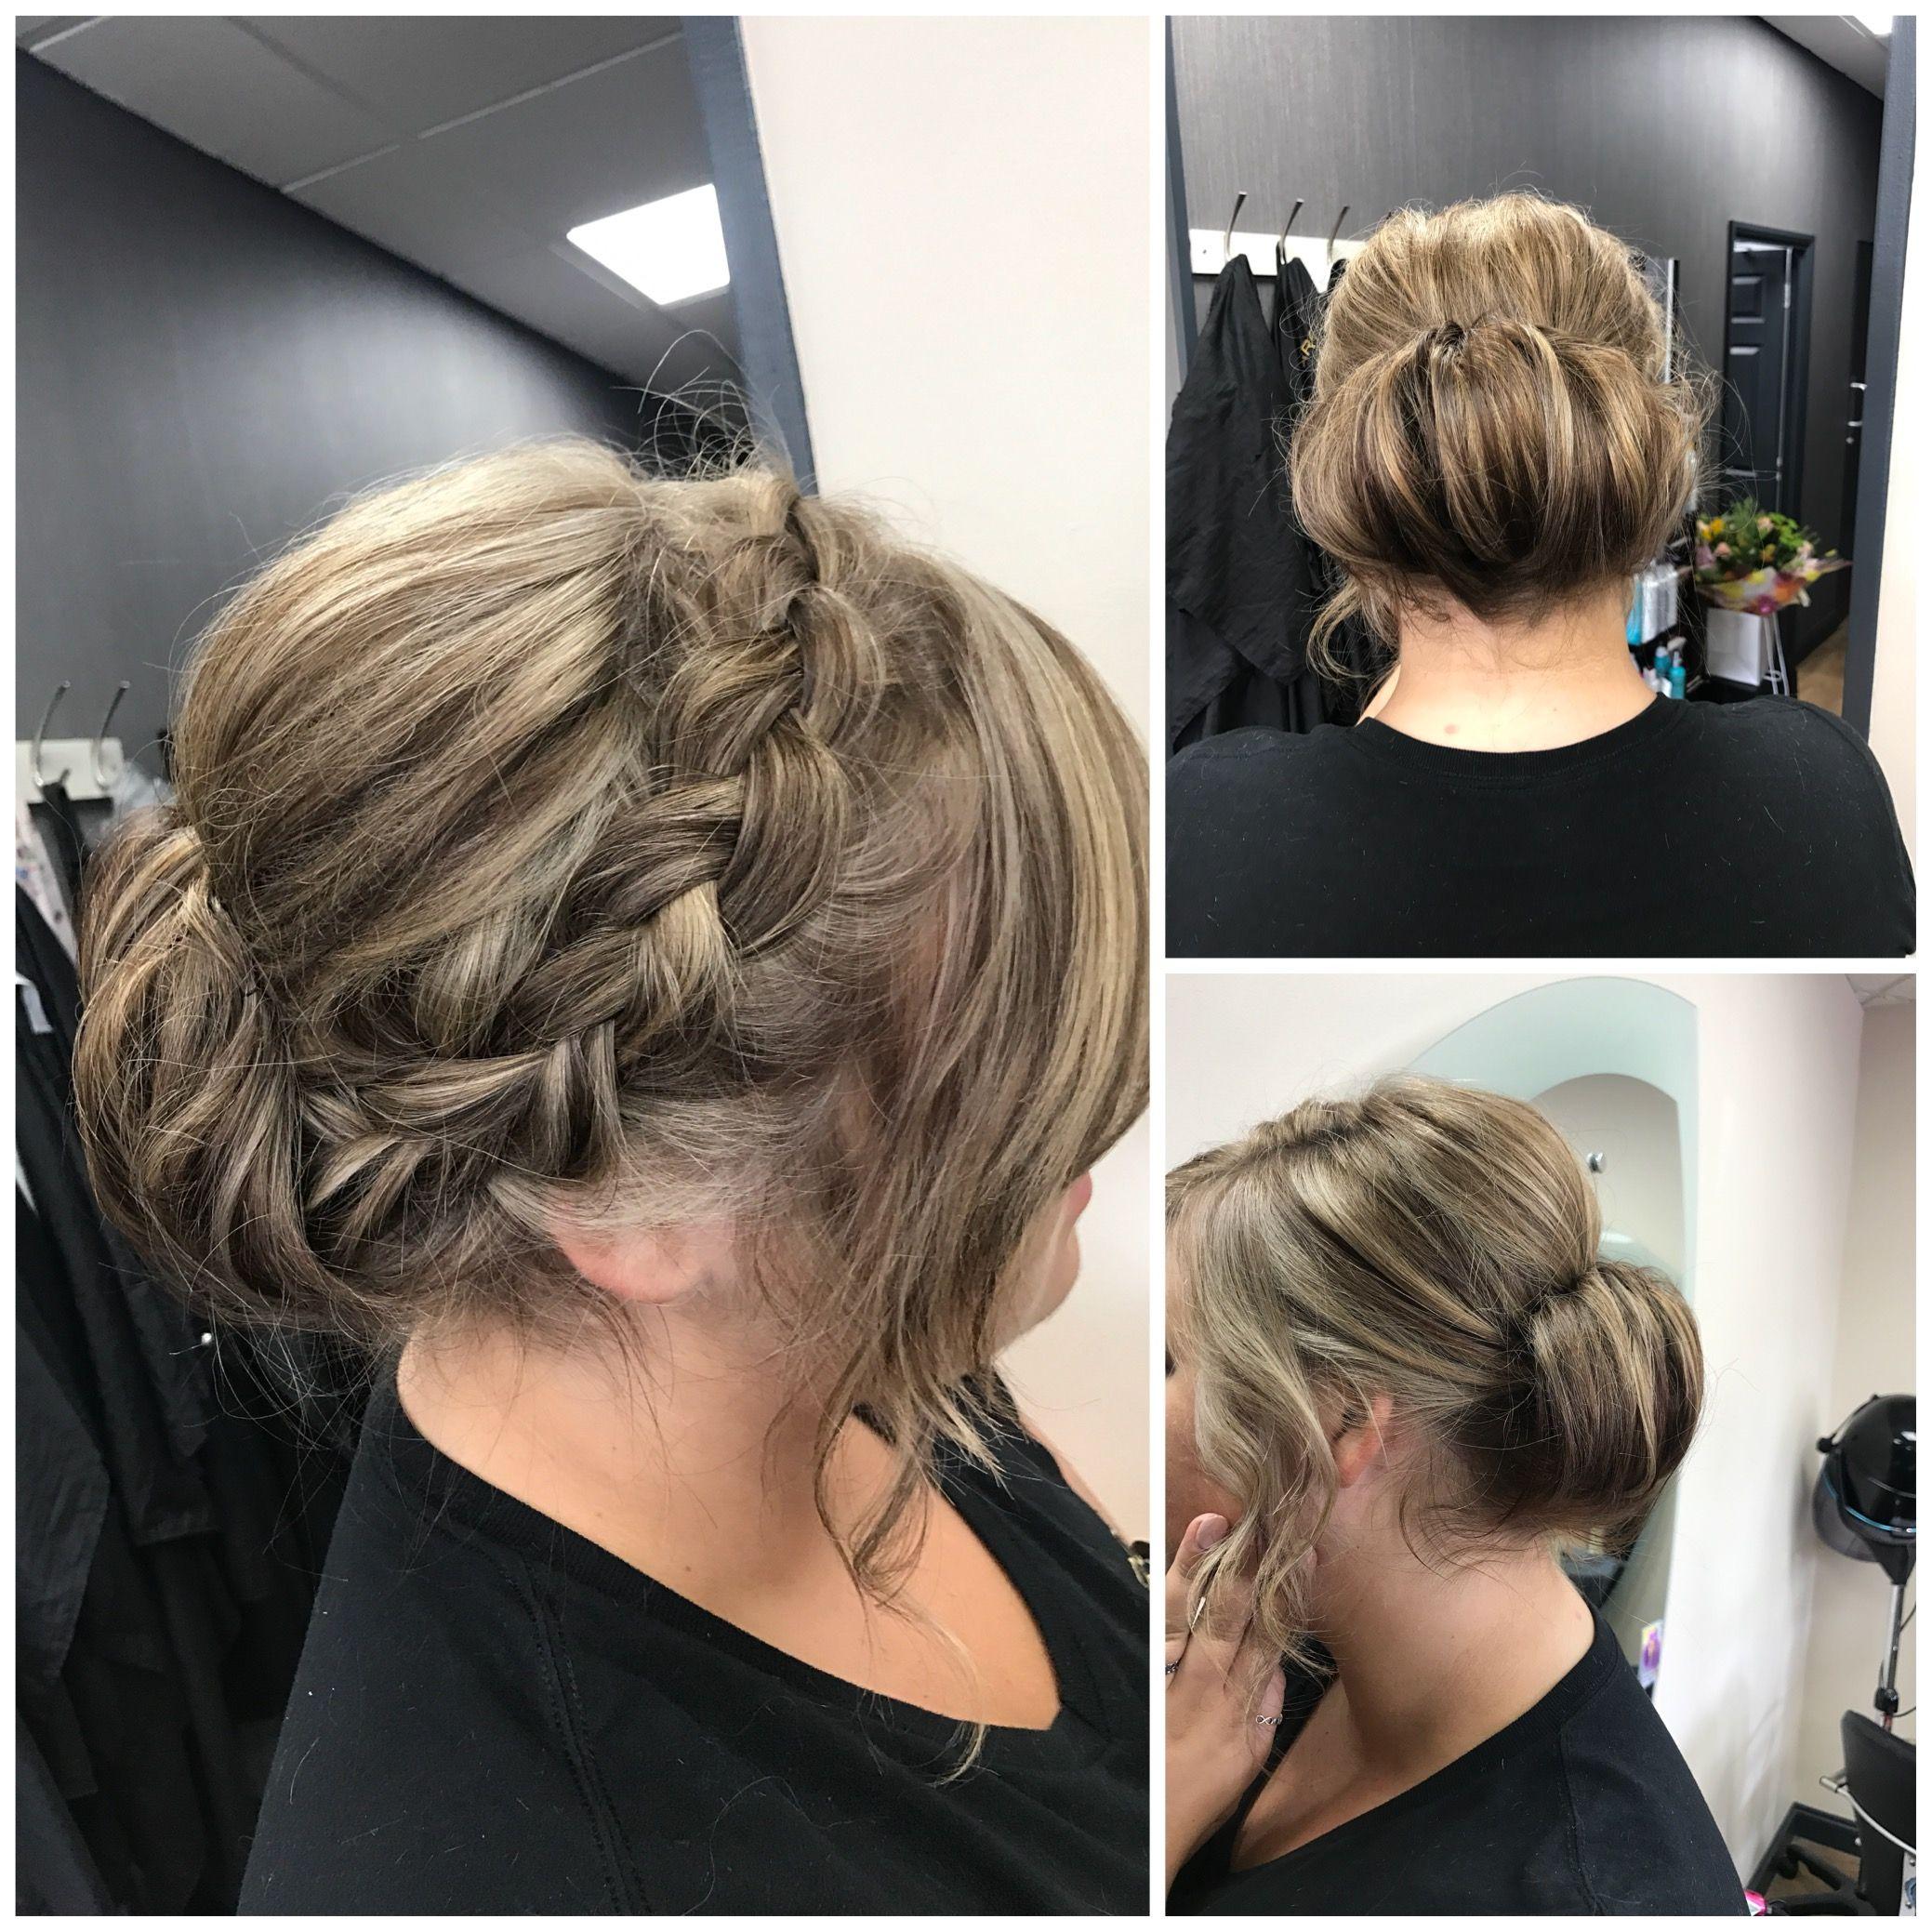 Hairup bridalhair hairbyellie arcanasalon hairstyle ellieus